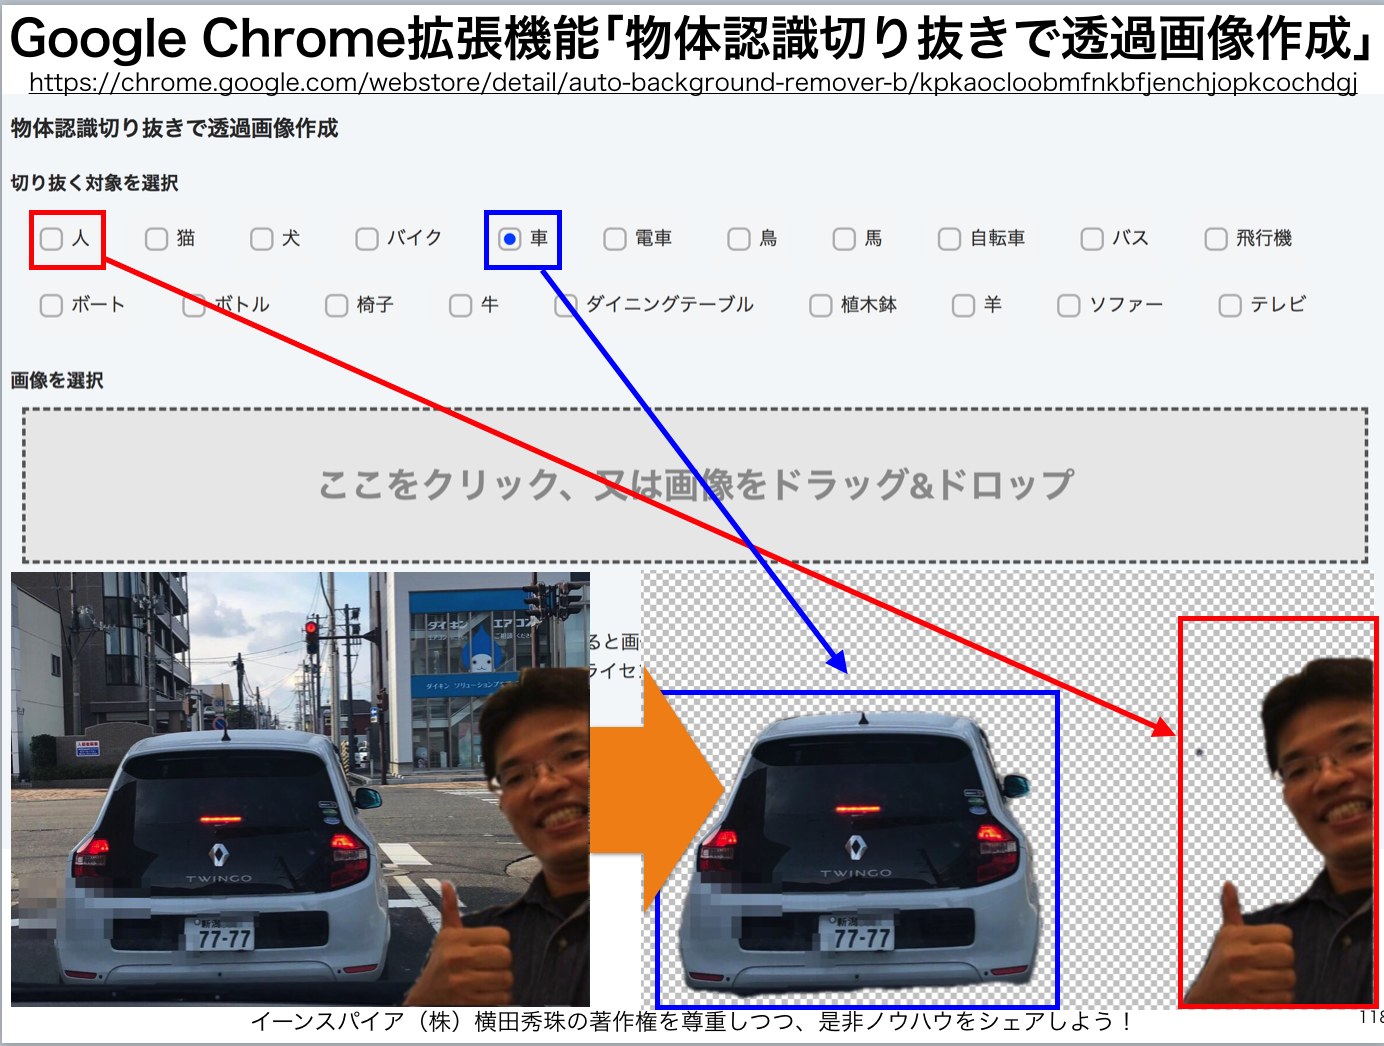 Google Chrome拡張機能「物体認識切り抜きで透過画像作成」